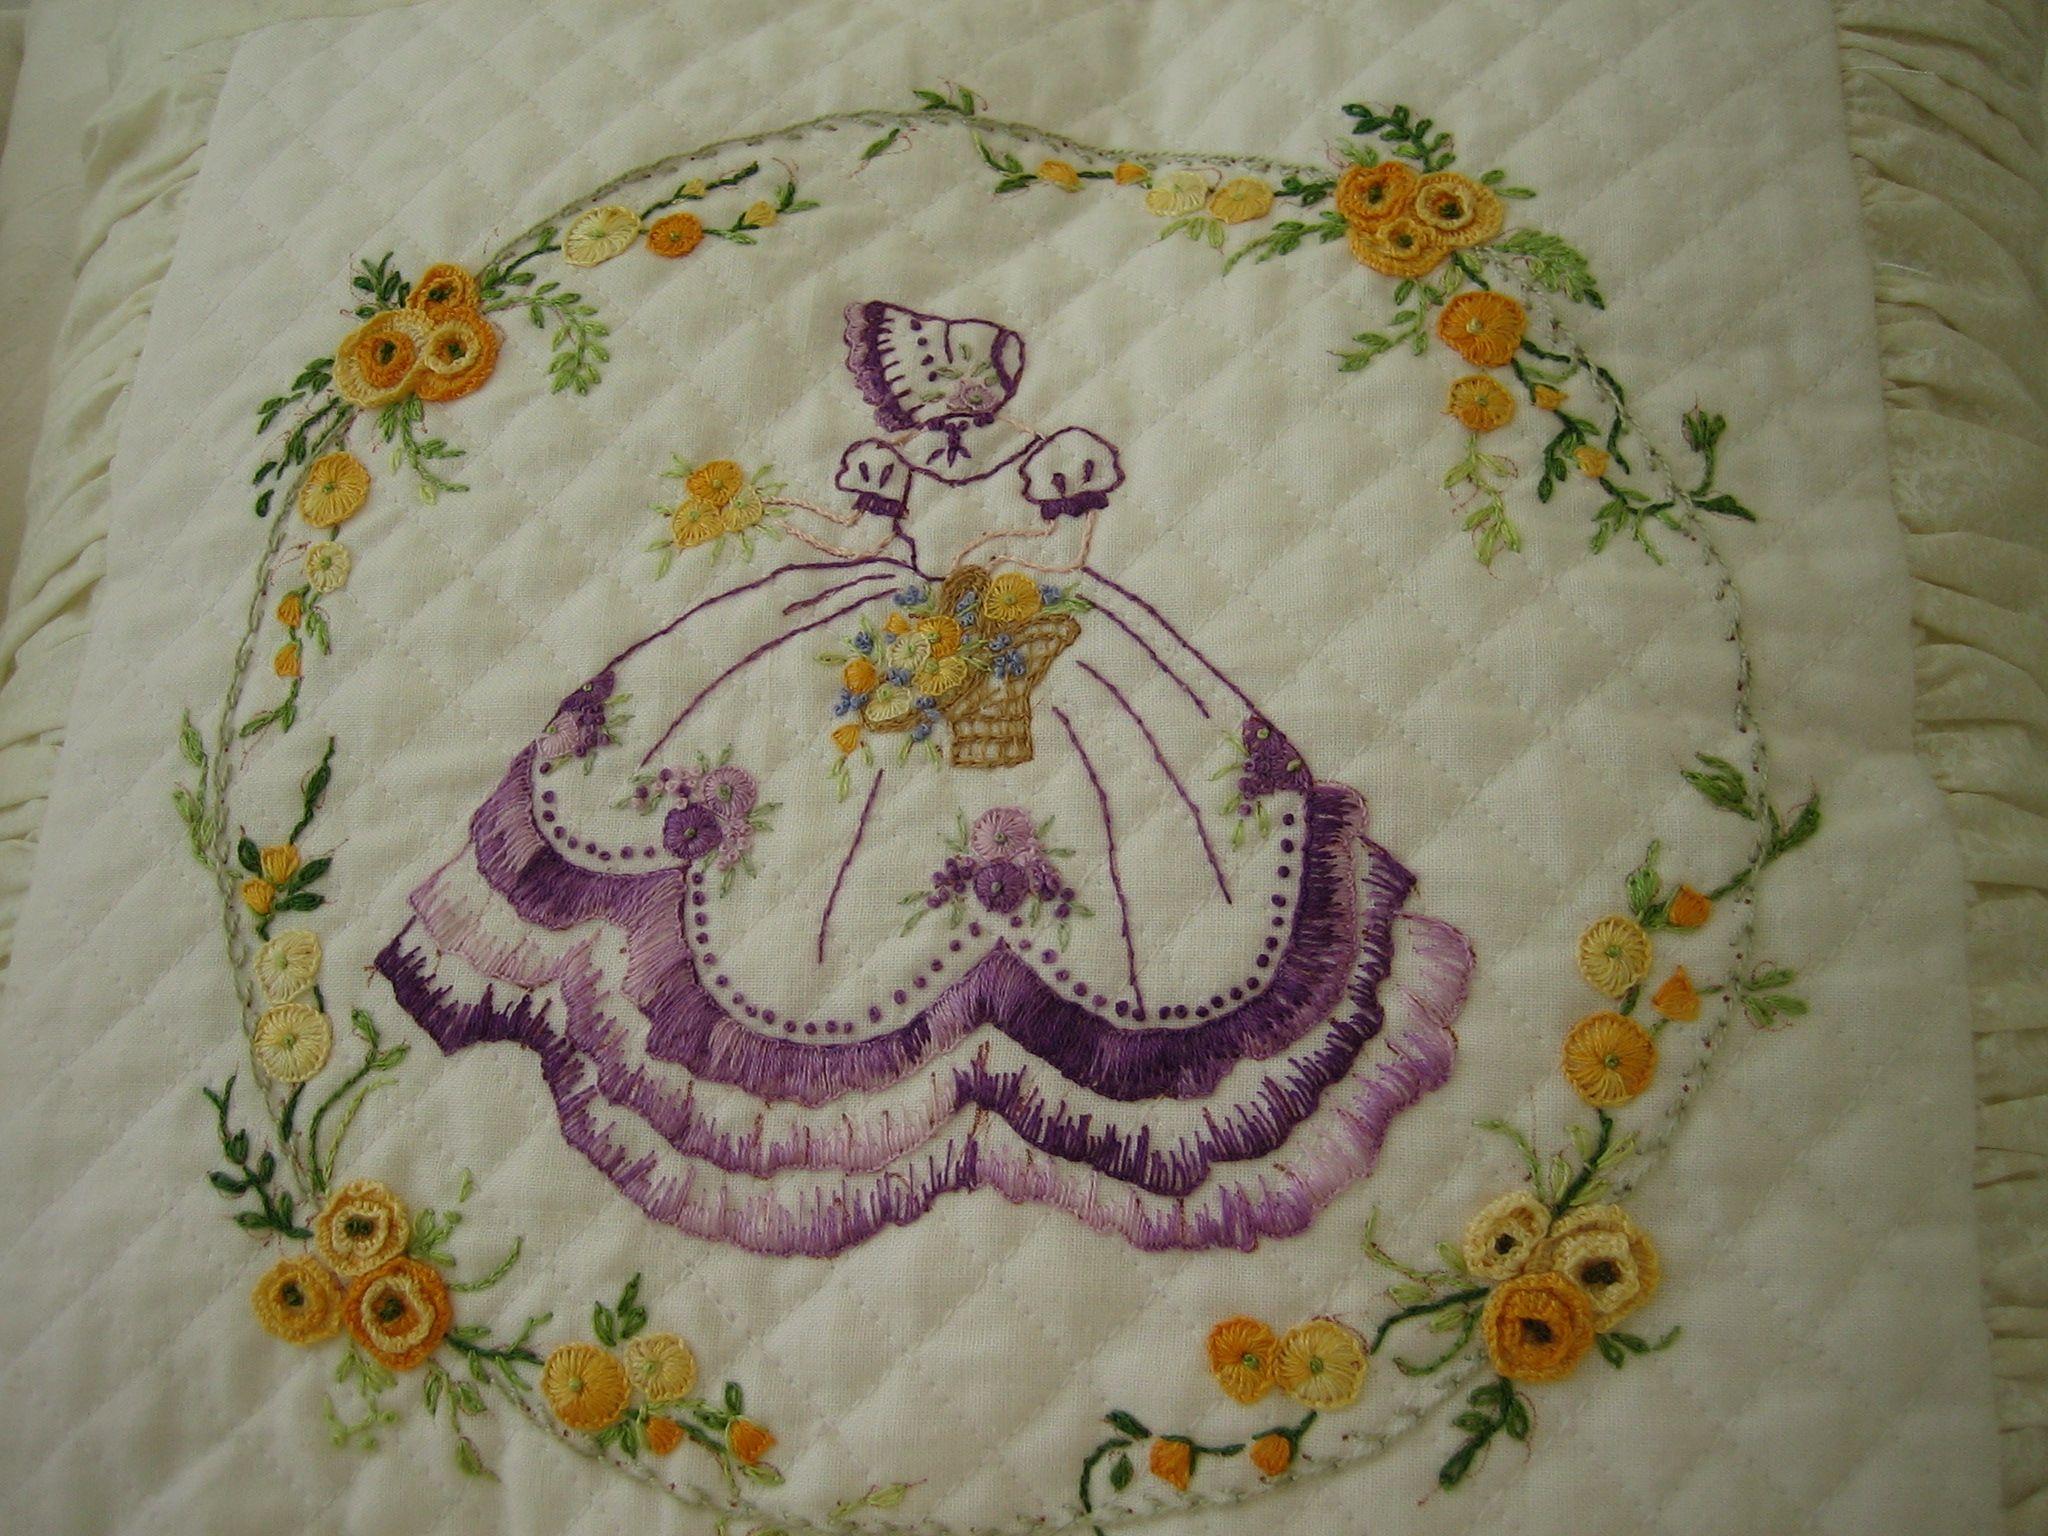 Crinoline Lady | bordado tradicional | Pinterest | Tradicional y Bordado